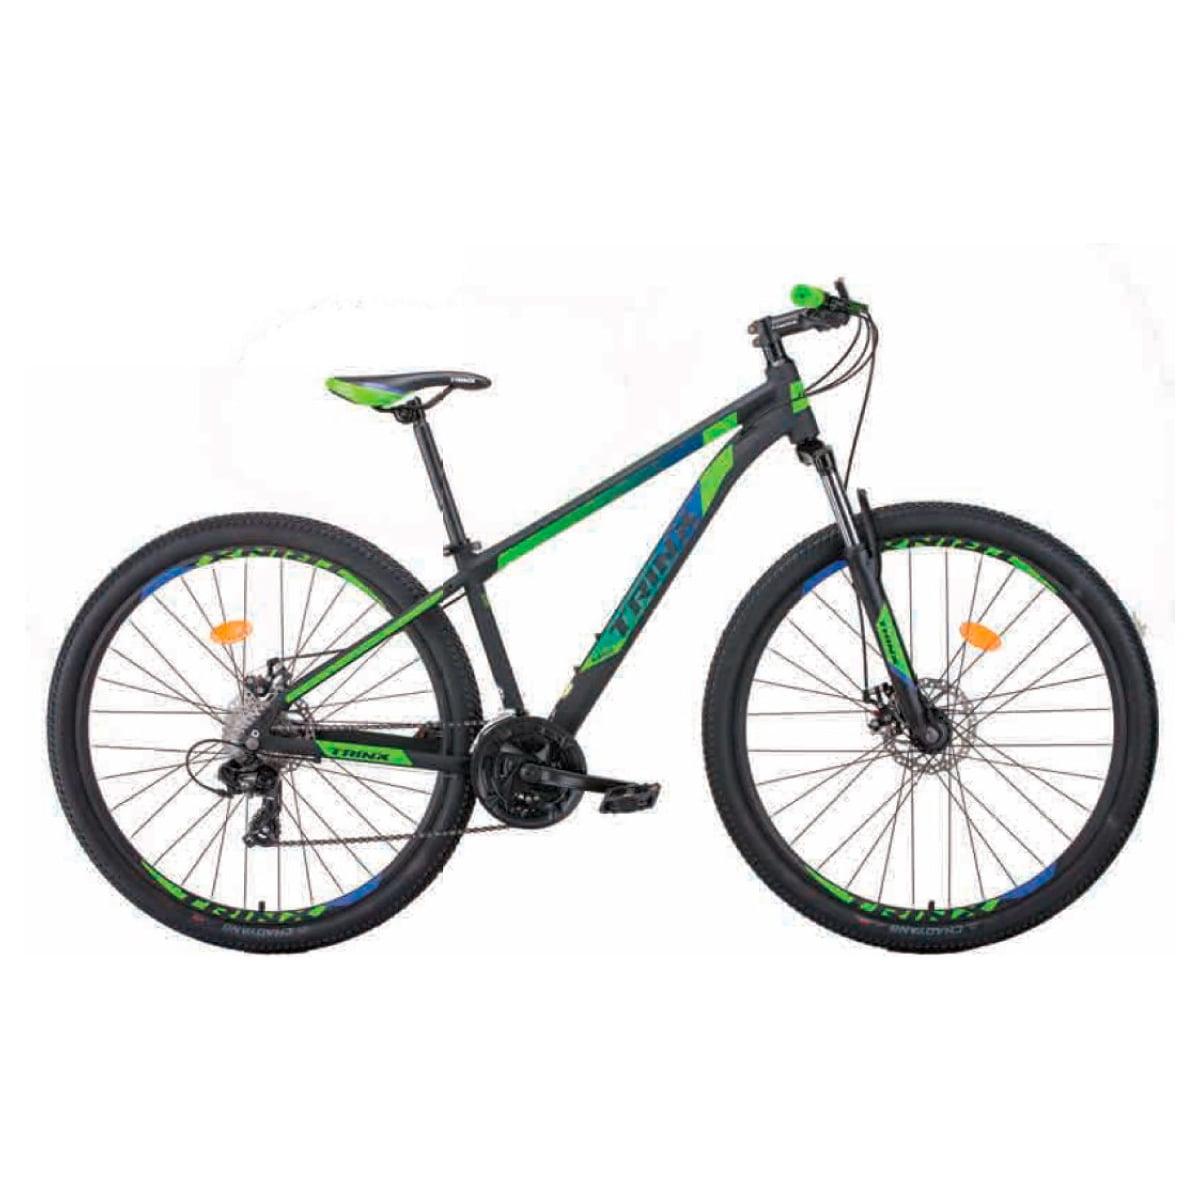 Bike Trinx M100 Max 2020 24v Shimano Verde Azul